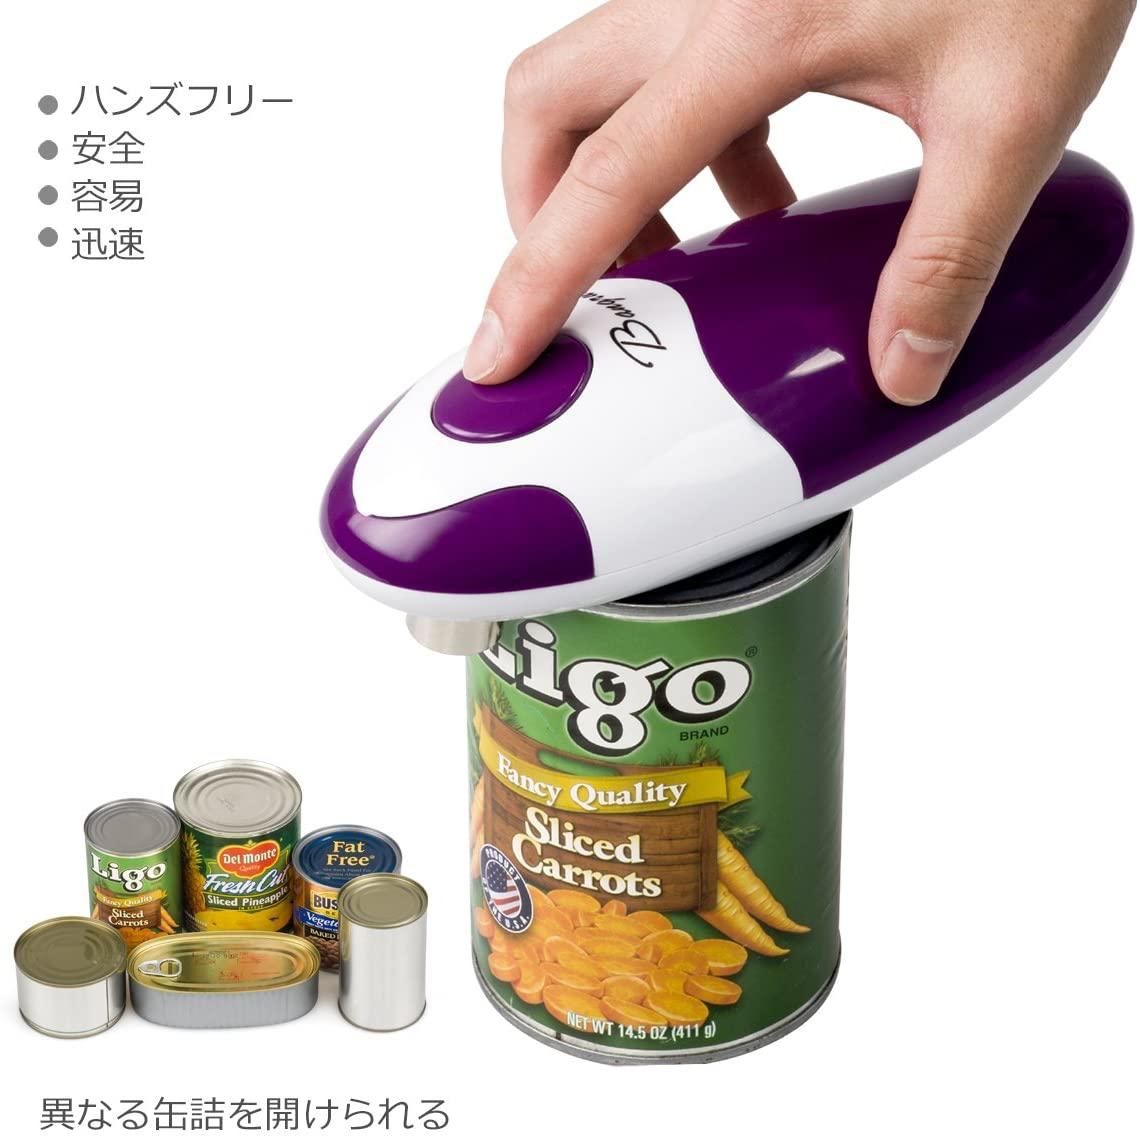 Bangrui(バングルイ) 電動 缶切り 平滑エッジの商品画像5